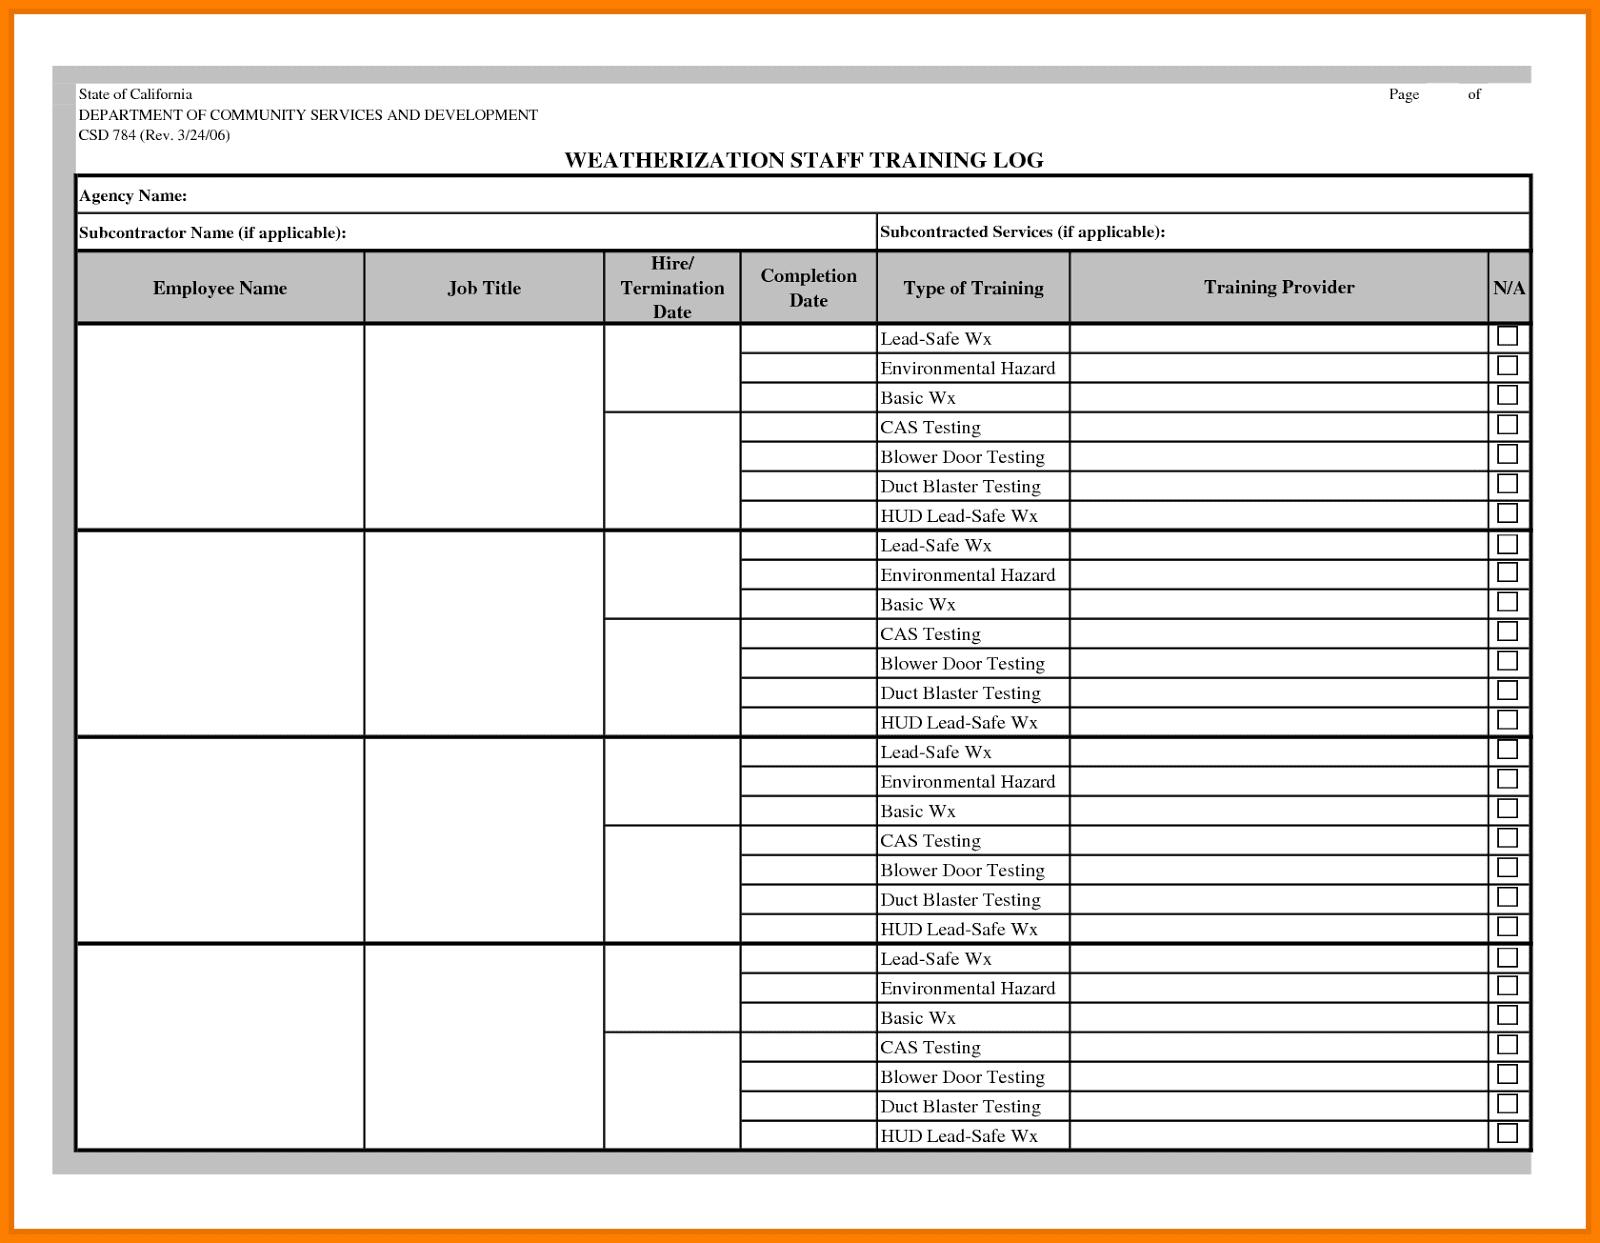 Workouts log templates printable in PDF